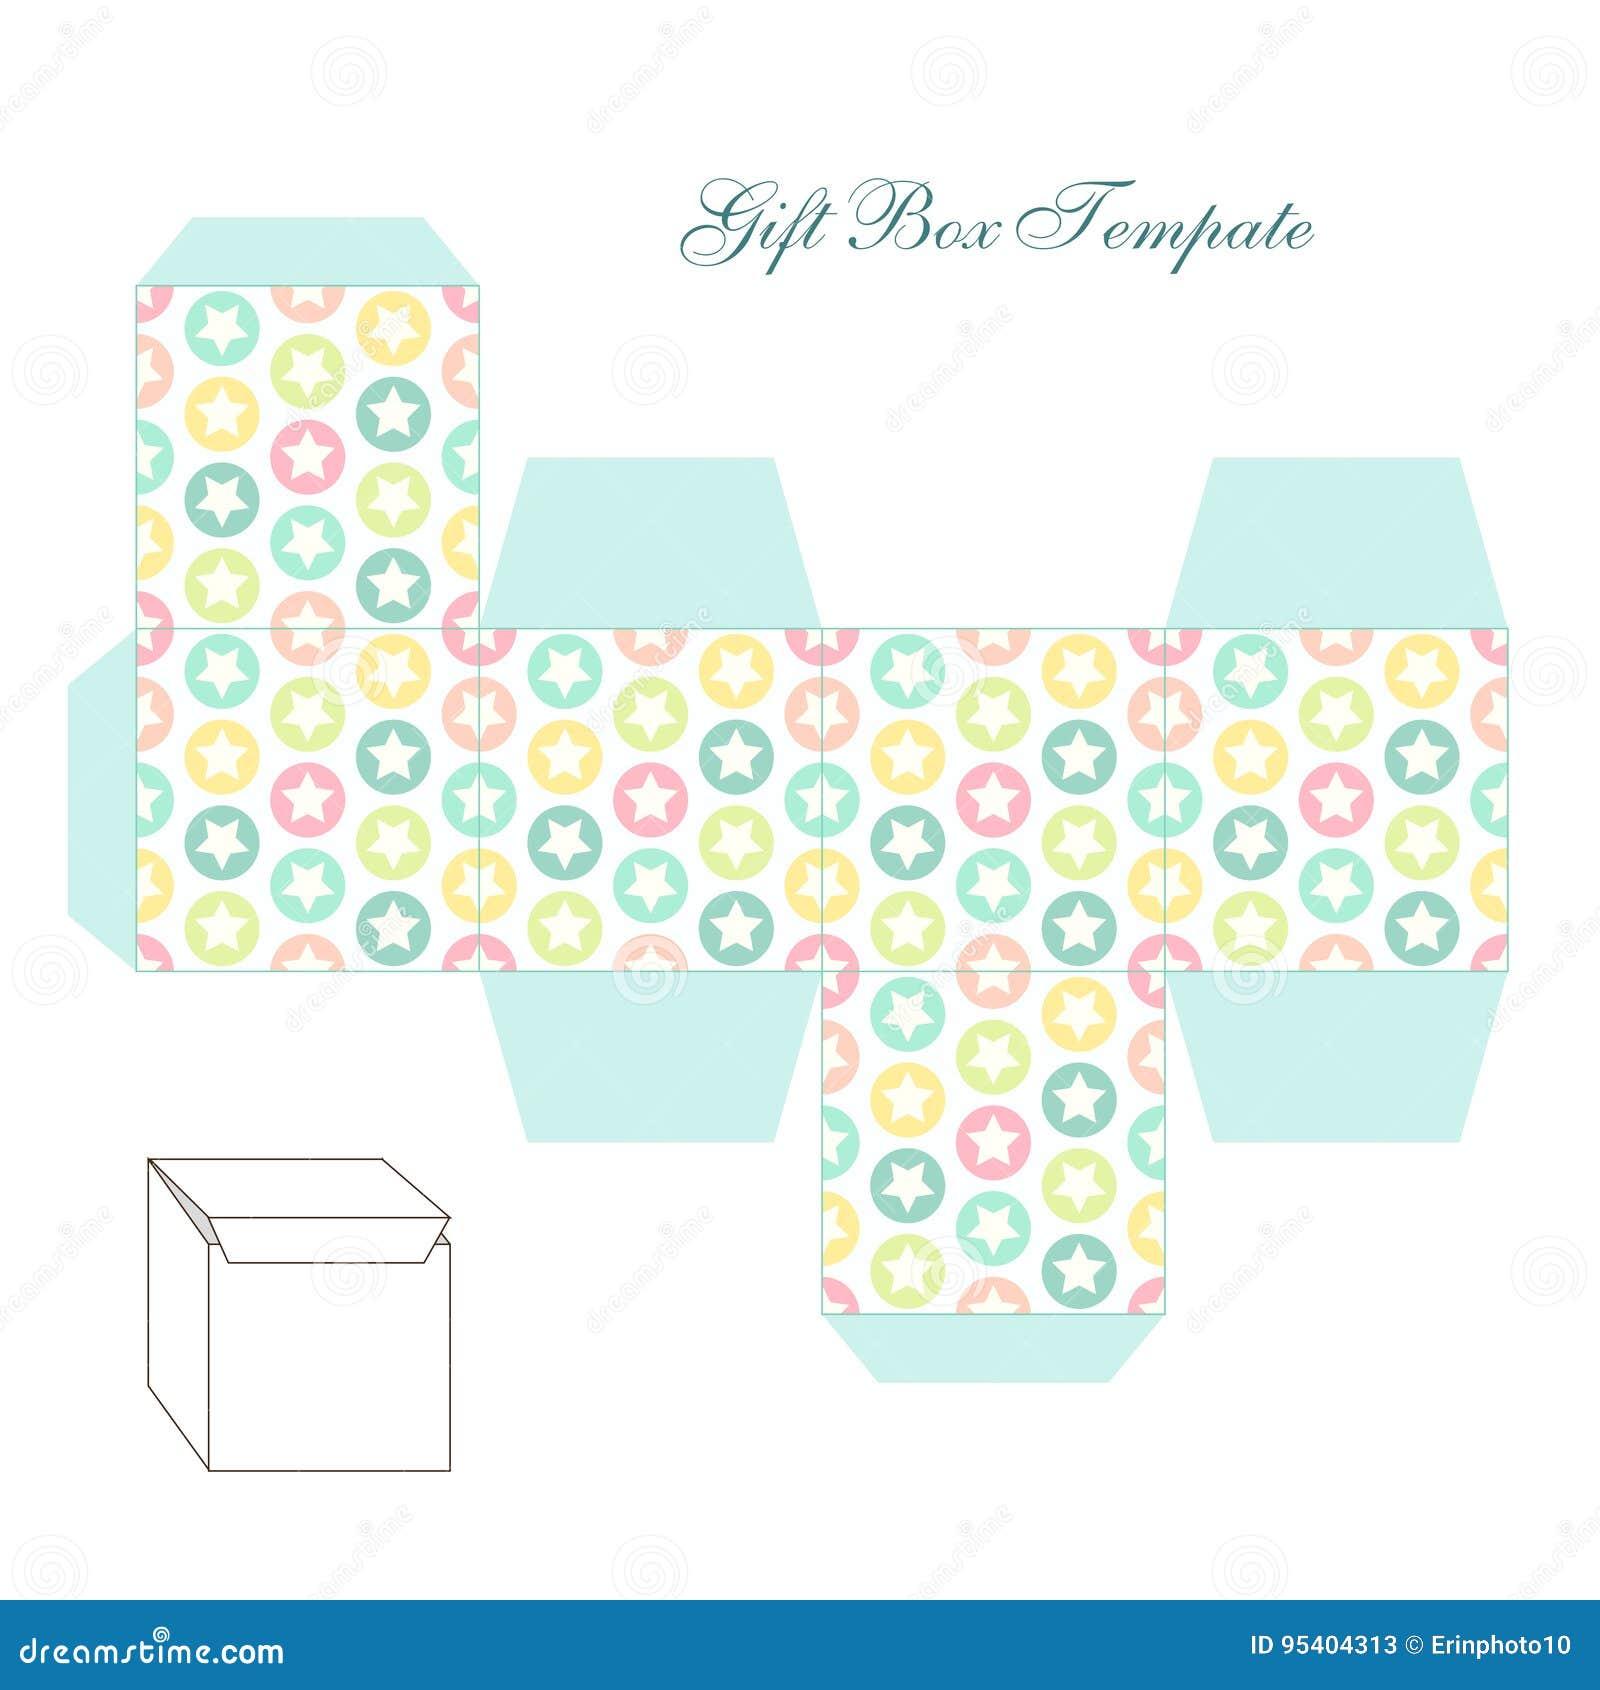 cute retro square gift box template with stars ornament to print